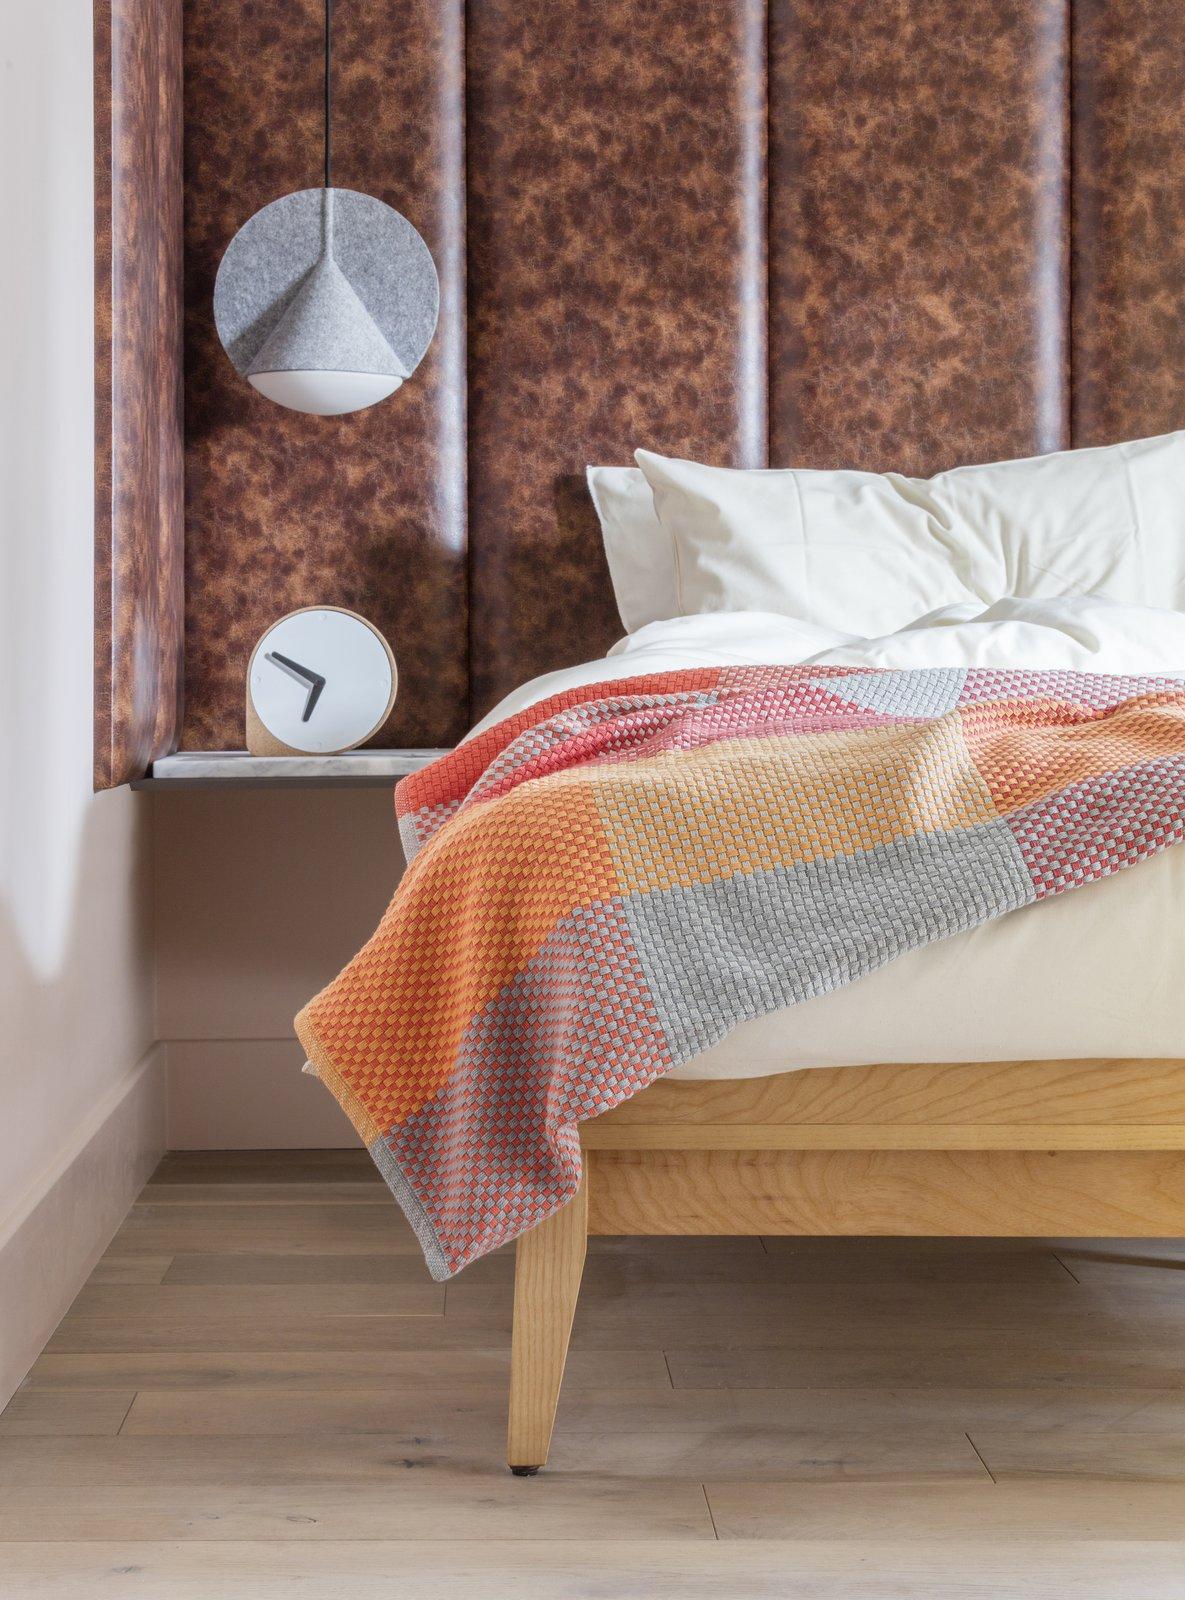 Bedroom, Medium Hardwood Floor, Bed, and Pendant Lighting  Photo 4 of 12 in Part Apartment, Part Boutique Hotel, Eden Locke Brings a New Brand of Comfort to Edinburgh